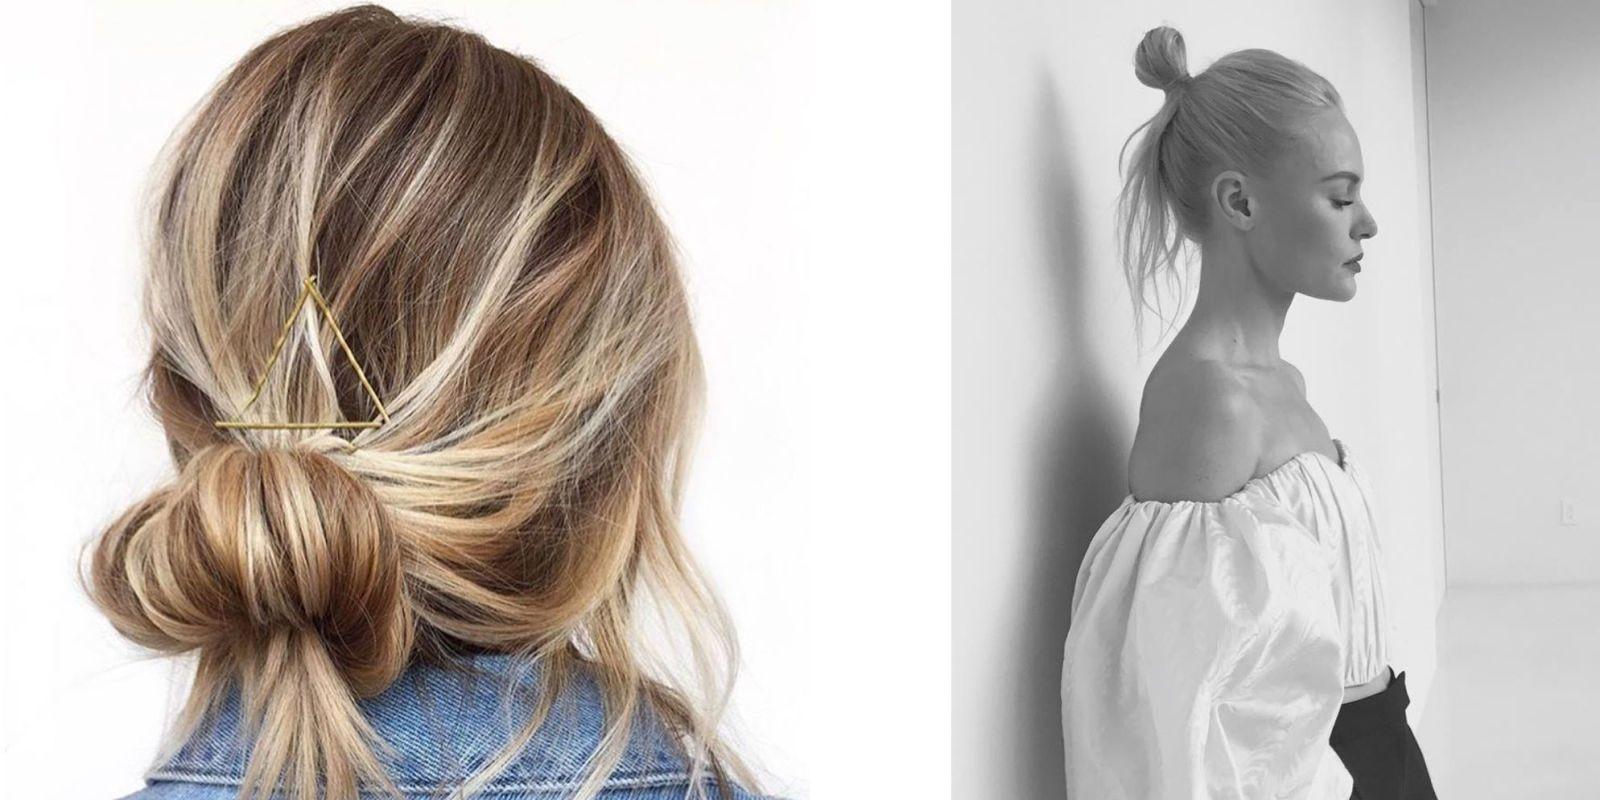 Acconciature capelli super lisci